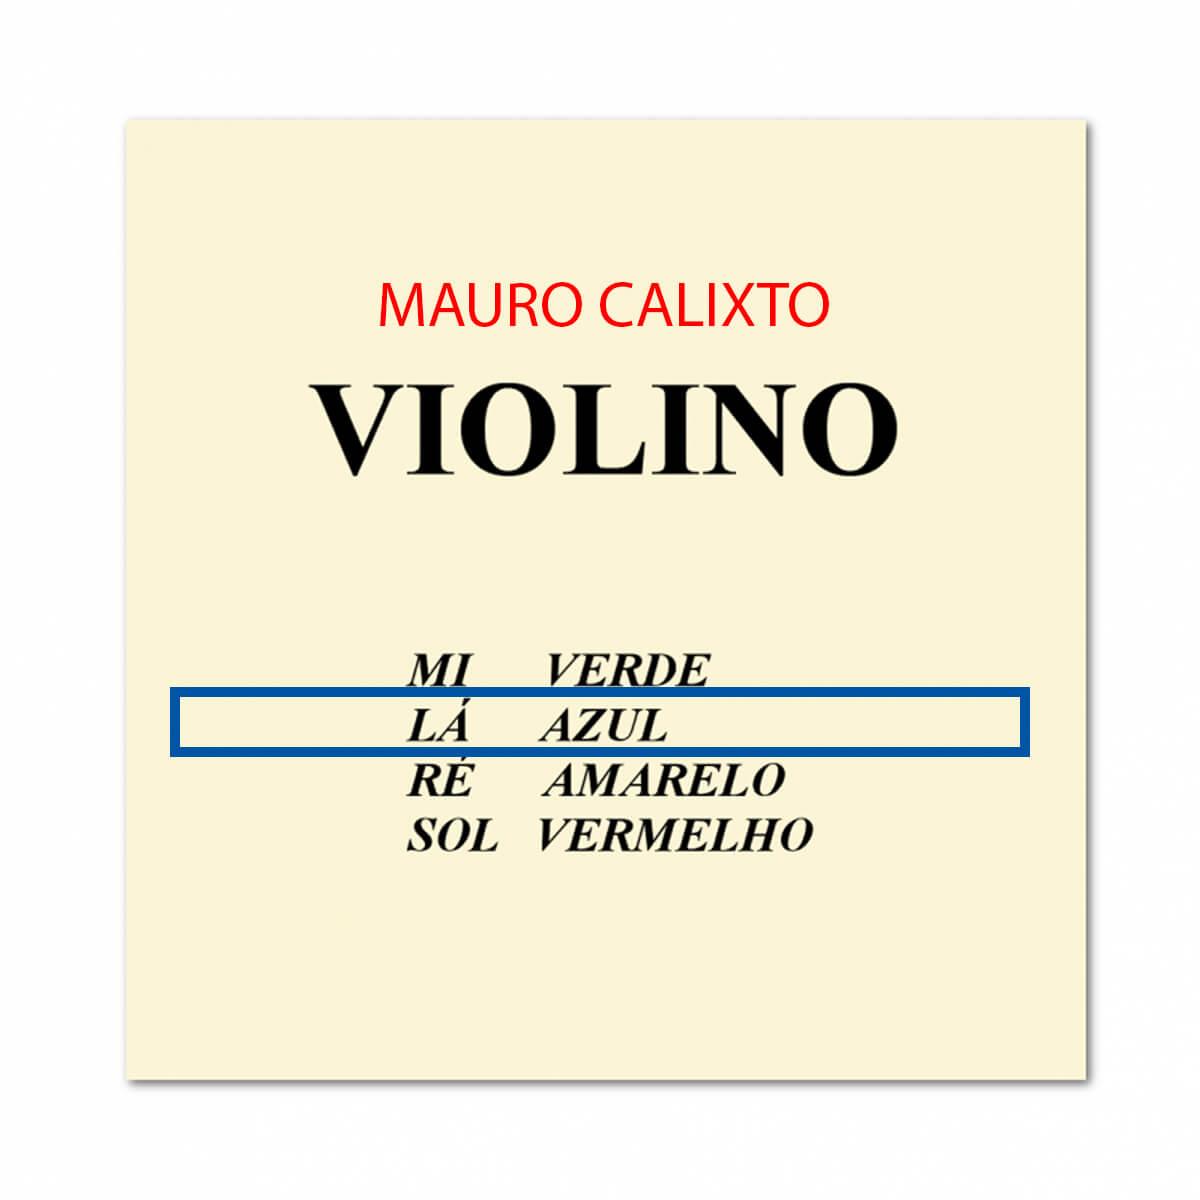 Encordoamento Para Violino - Mauro Calixto